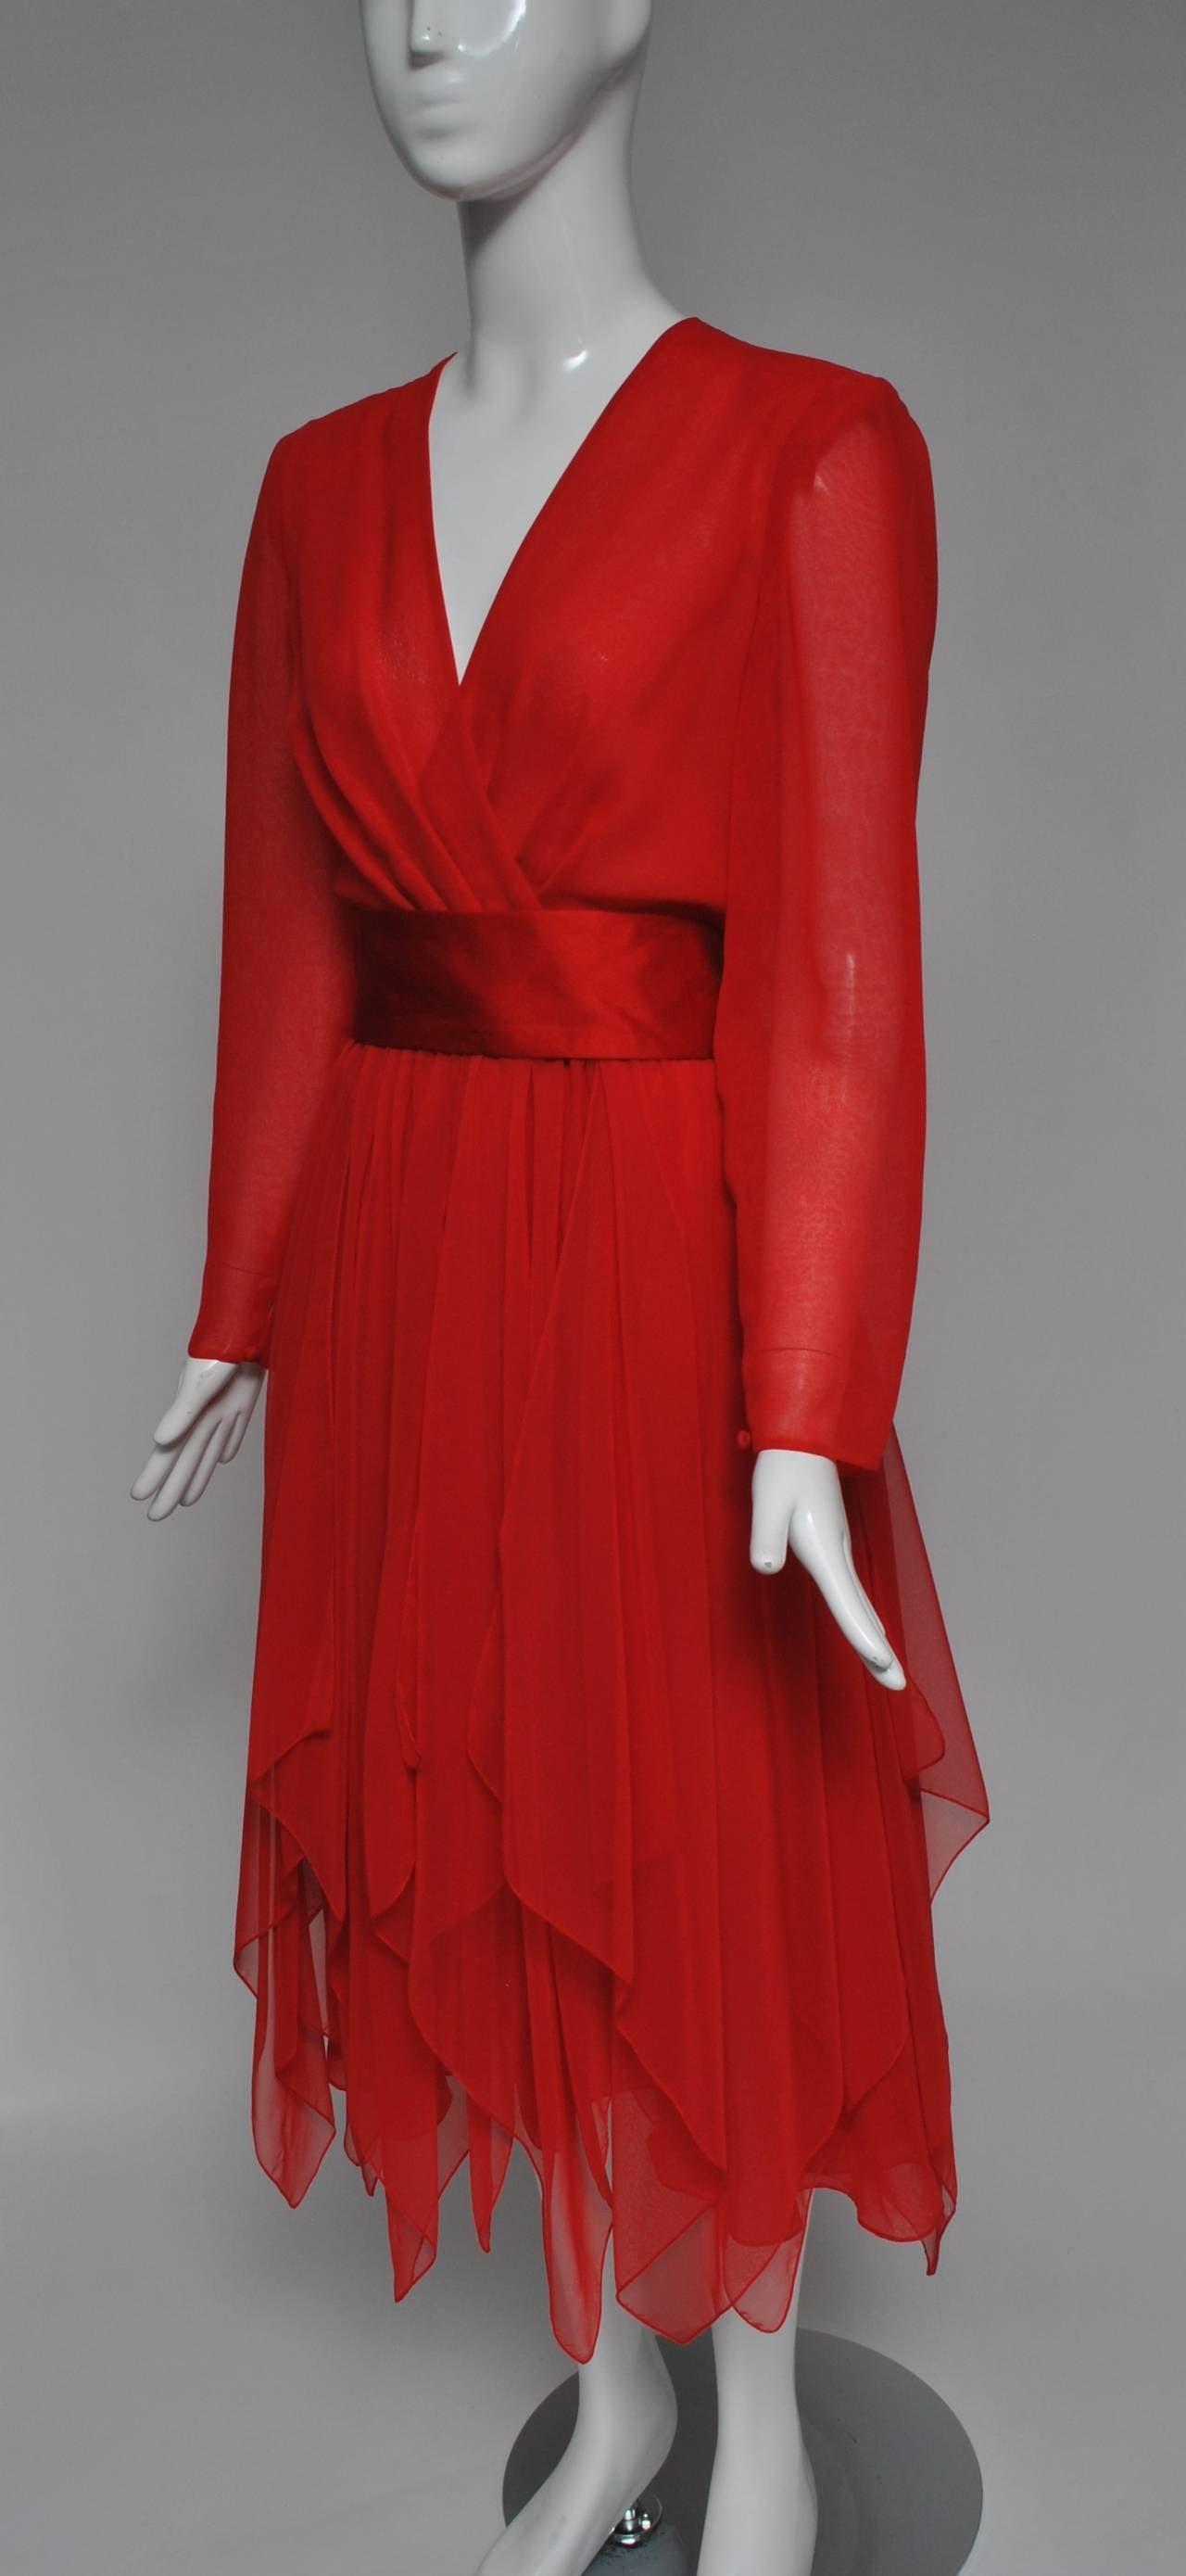 Estevez Red Chiffon Handkerchief Dress 2